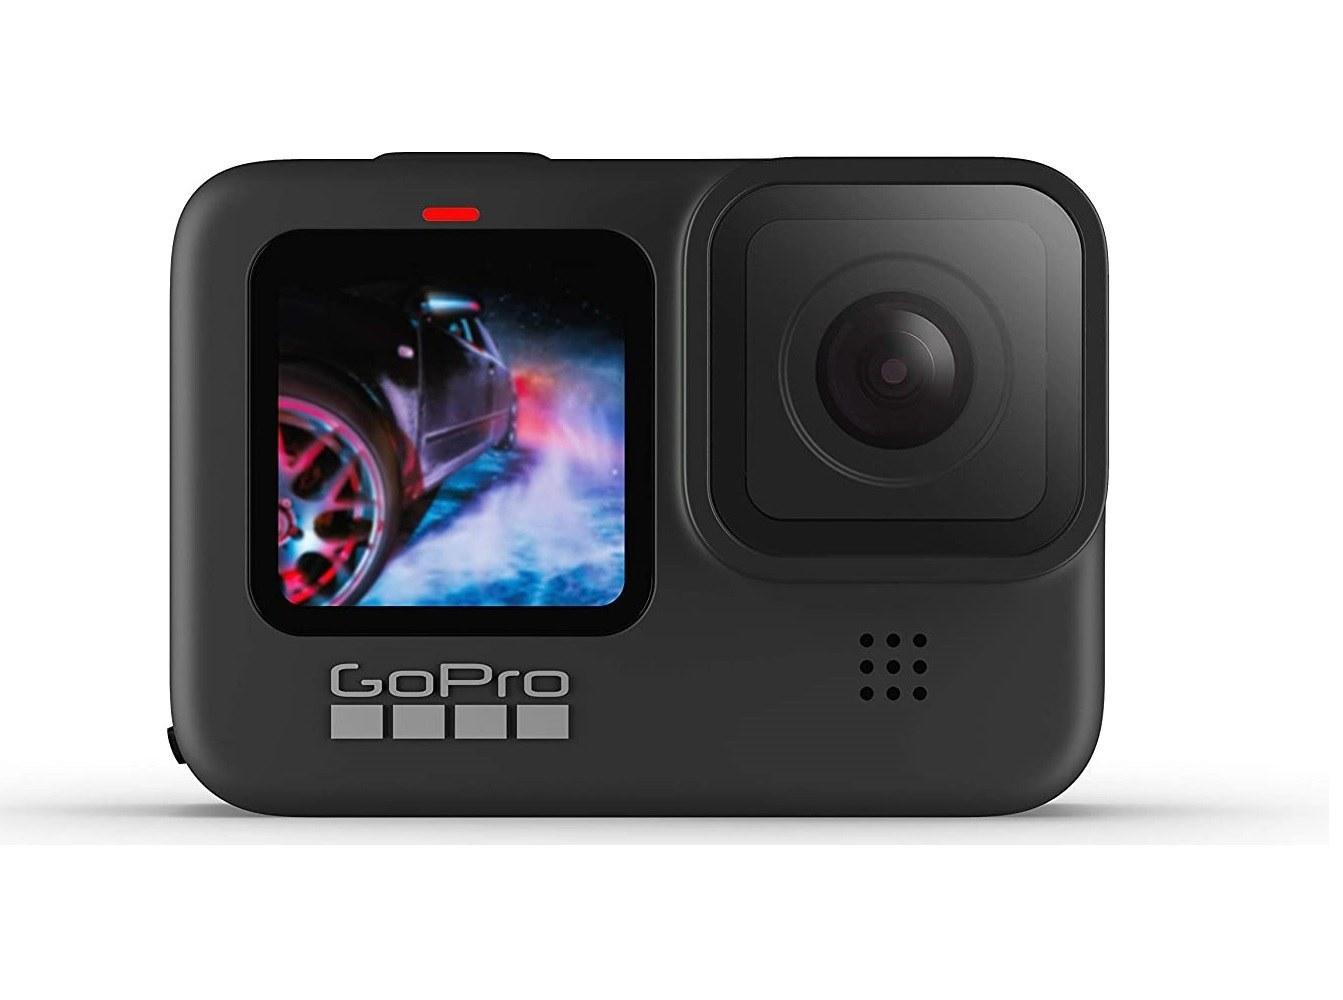 دوربین گوپرو GoPro HERO 9 Black